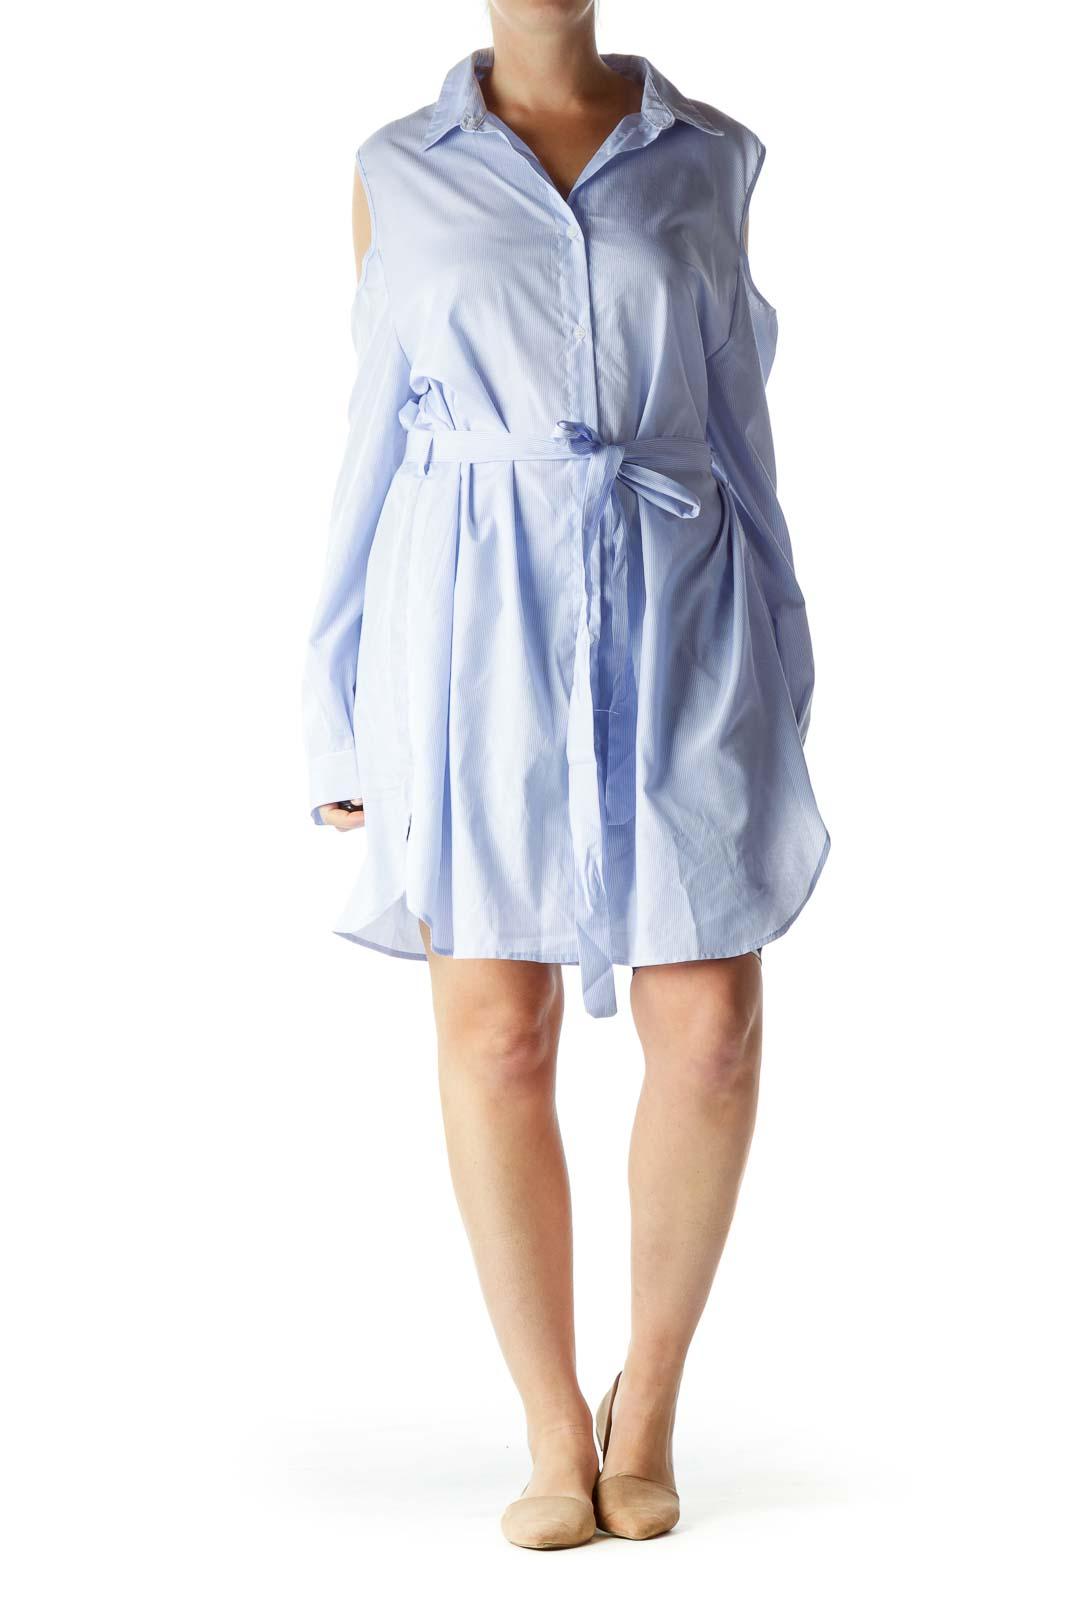 Blue White Pinstripe Off-Shoulder Day Dress